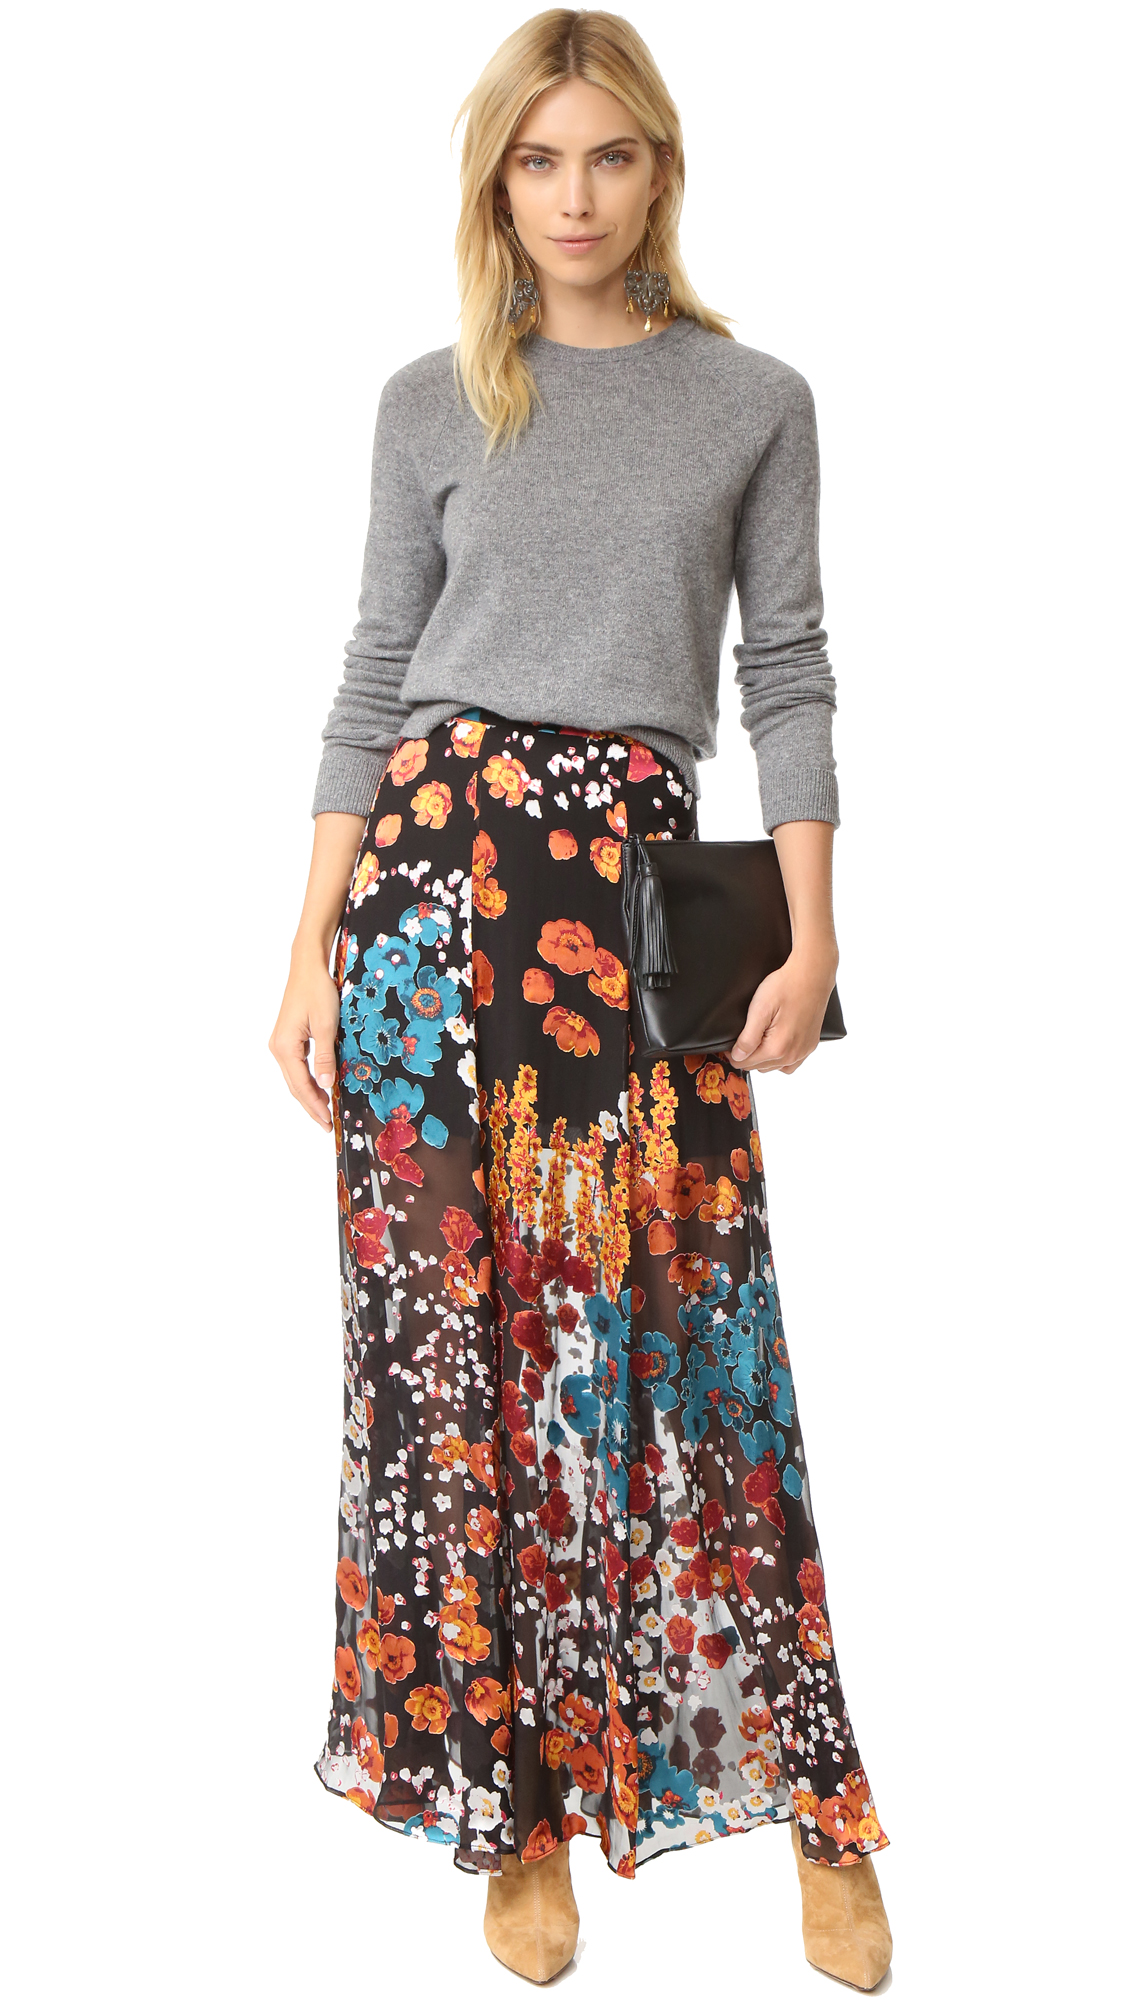 87ec5e6bda5a24 Floral Maxi Skirt Shopstyle | Saddha